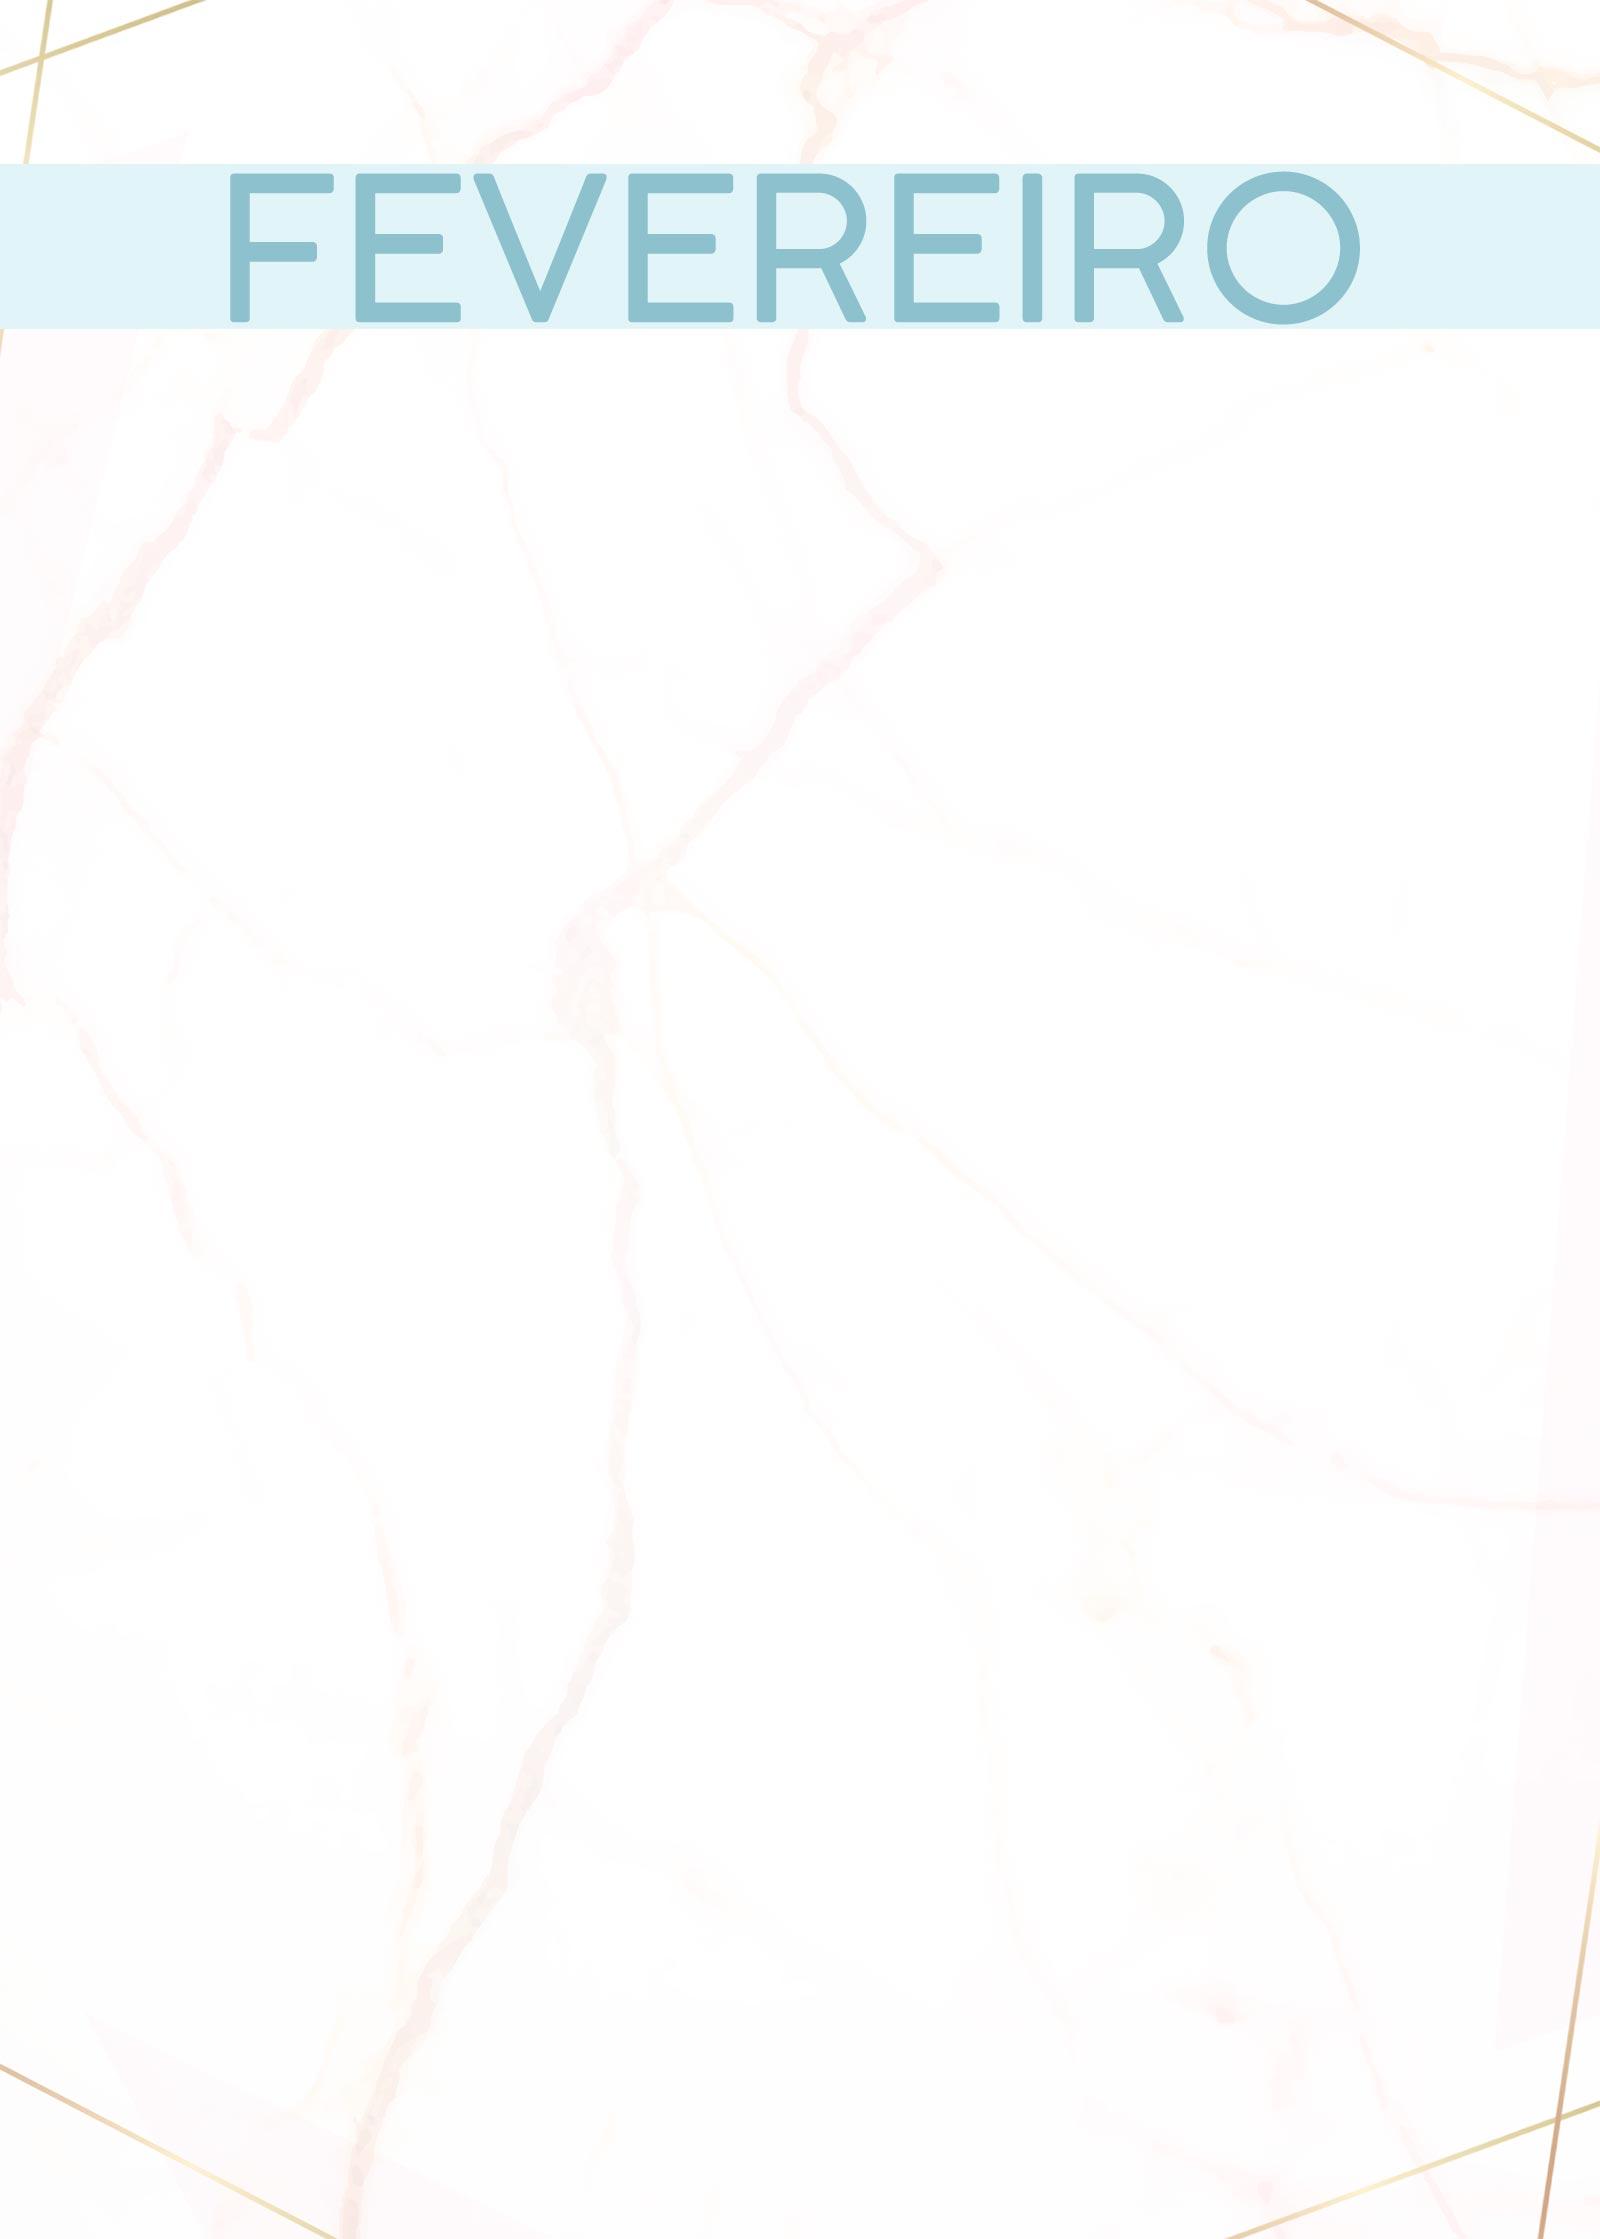 Planner Marmore capa fevereiro